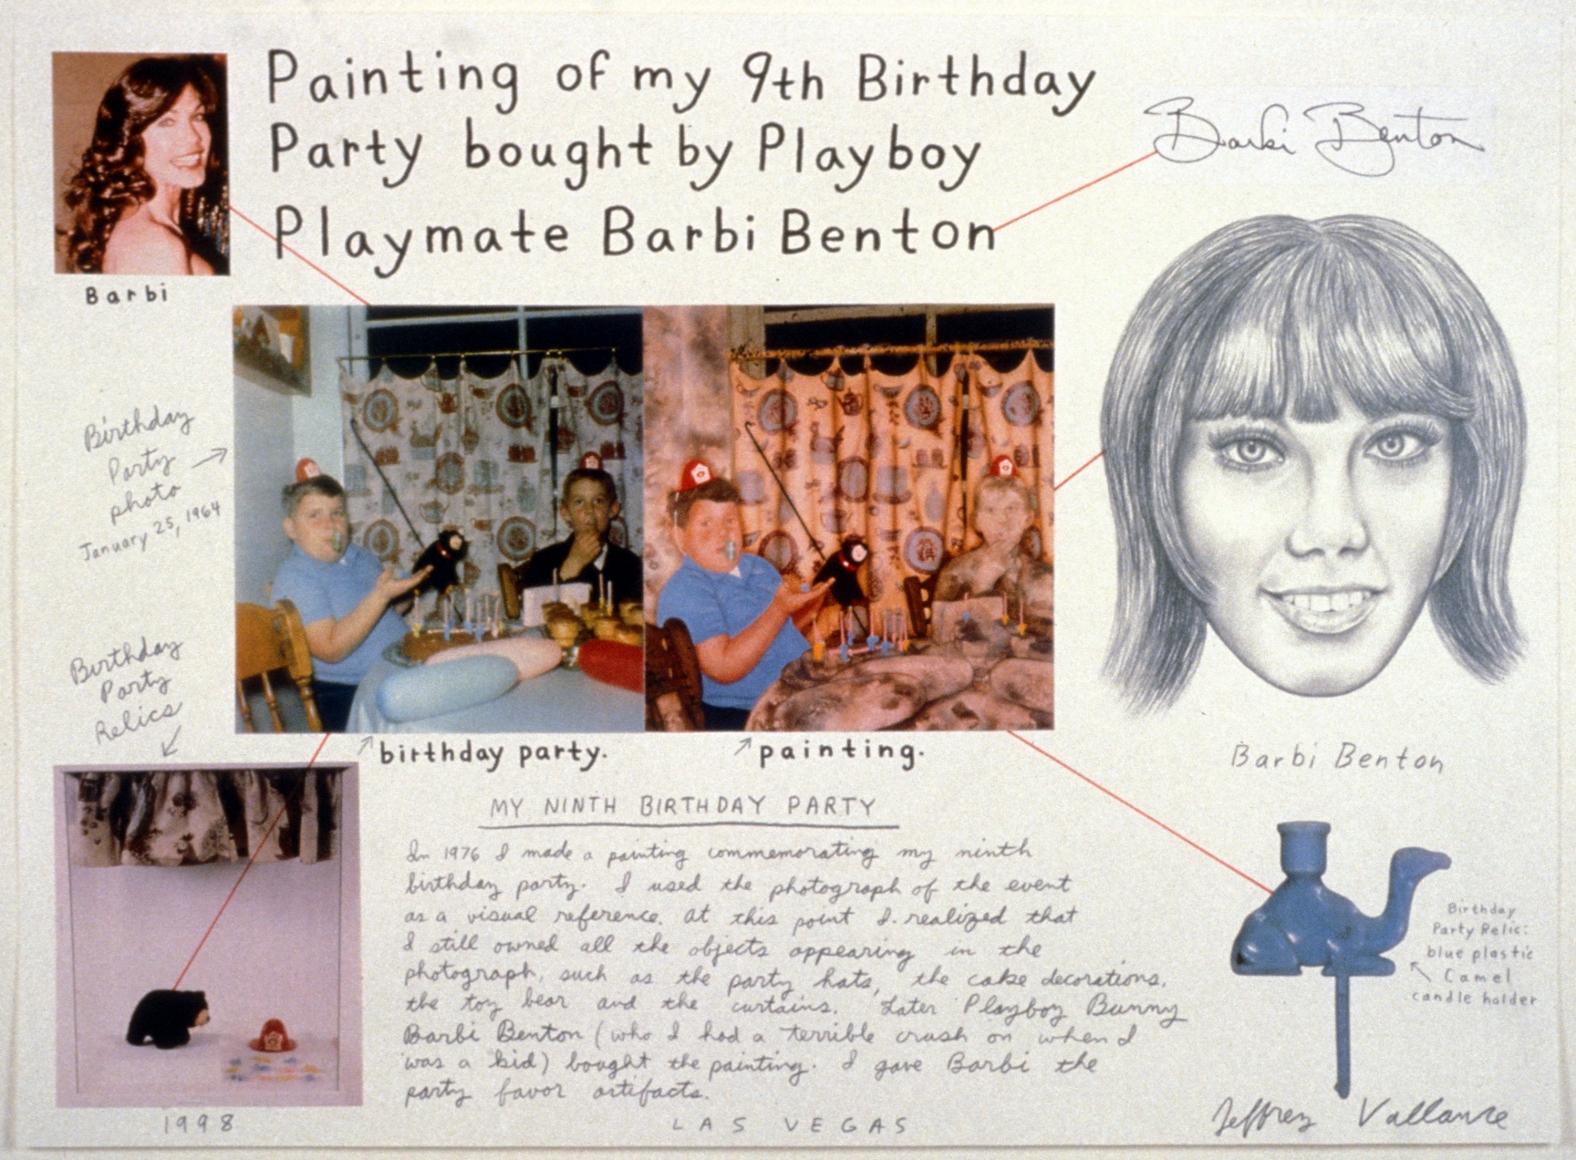 JEFFREY VALLANCE, Painting of My 9th Birthday Bought by Playboy Playmate Barbi Benton, 1998